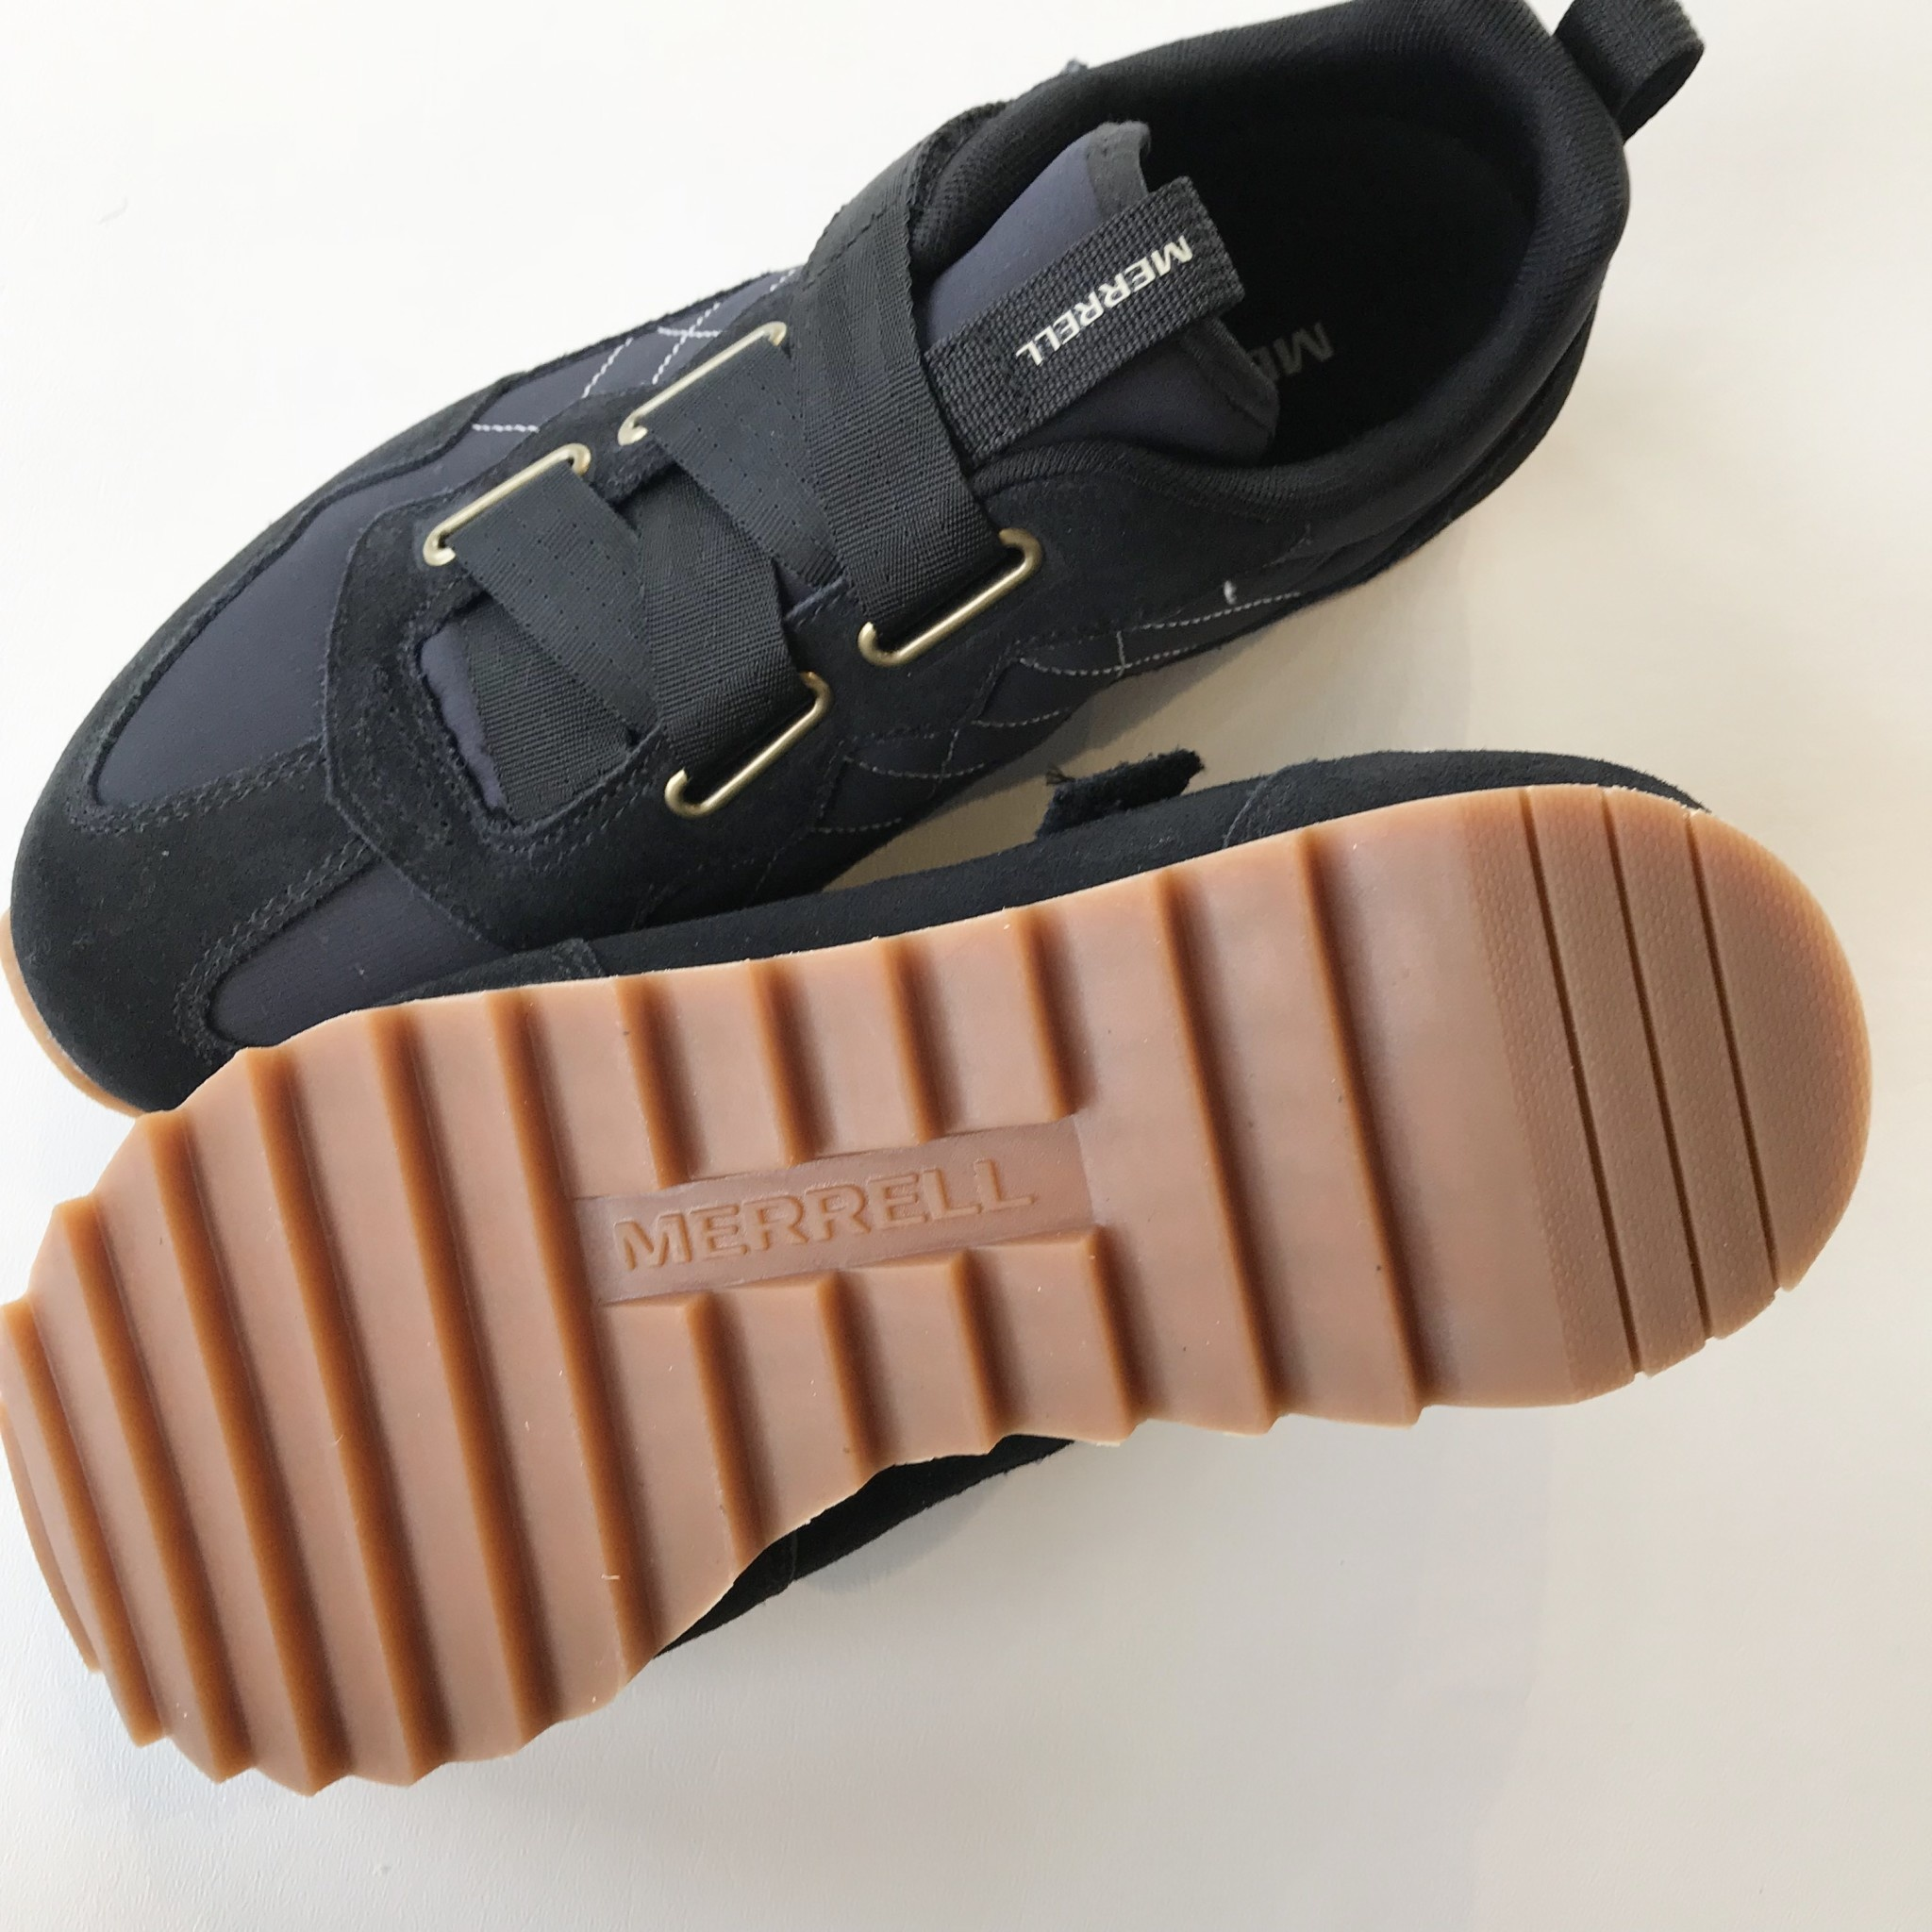 Merrell alpine sneaker cross